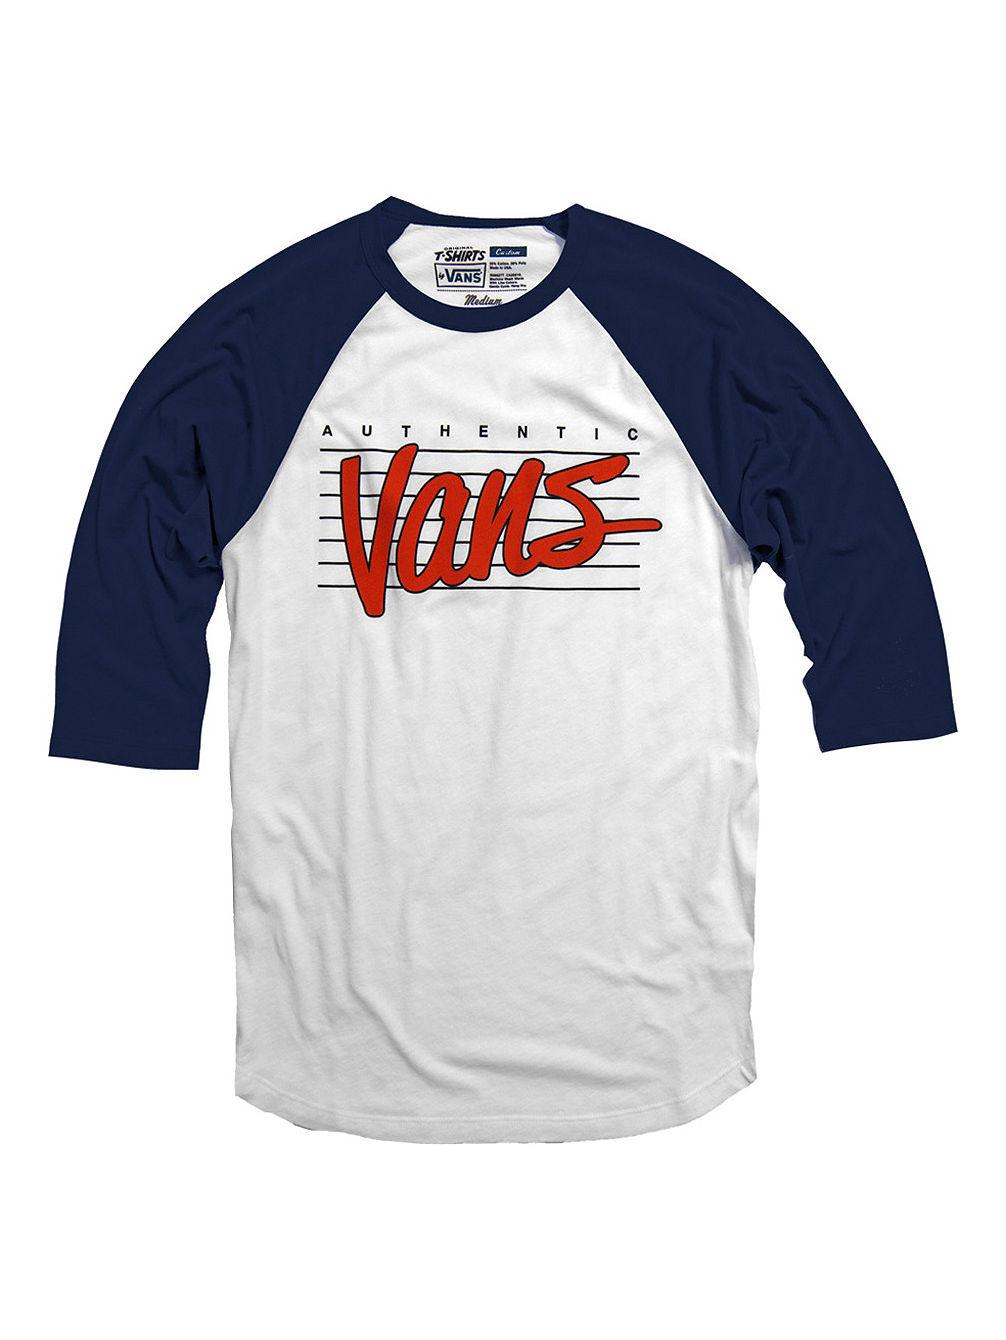 Buy Vans Authentic Vans Raglan T Shirt Ls Online At Blue